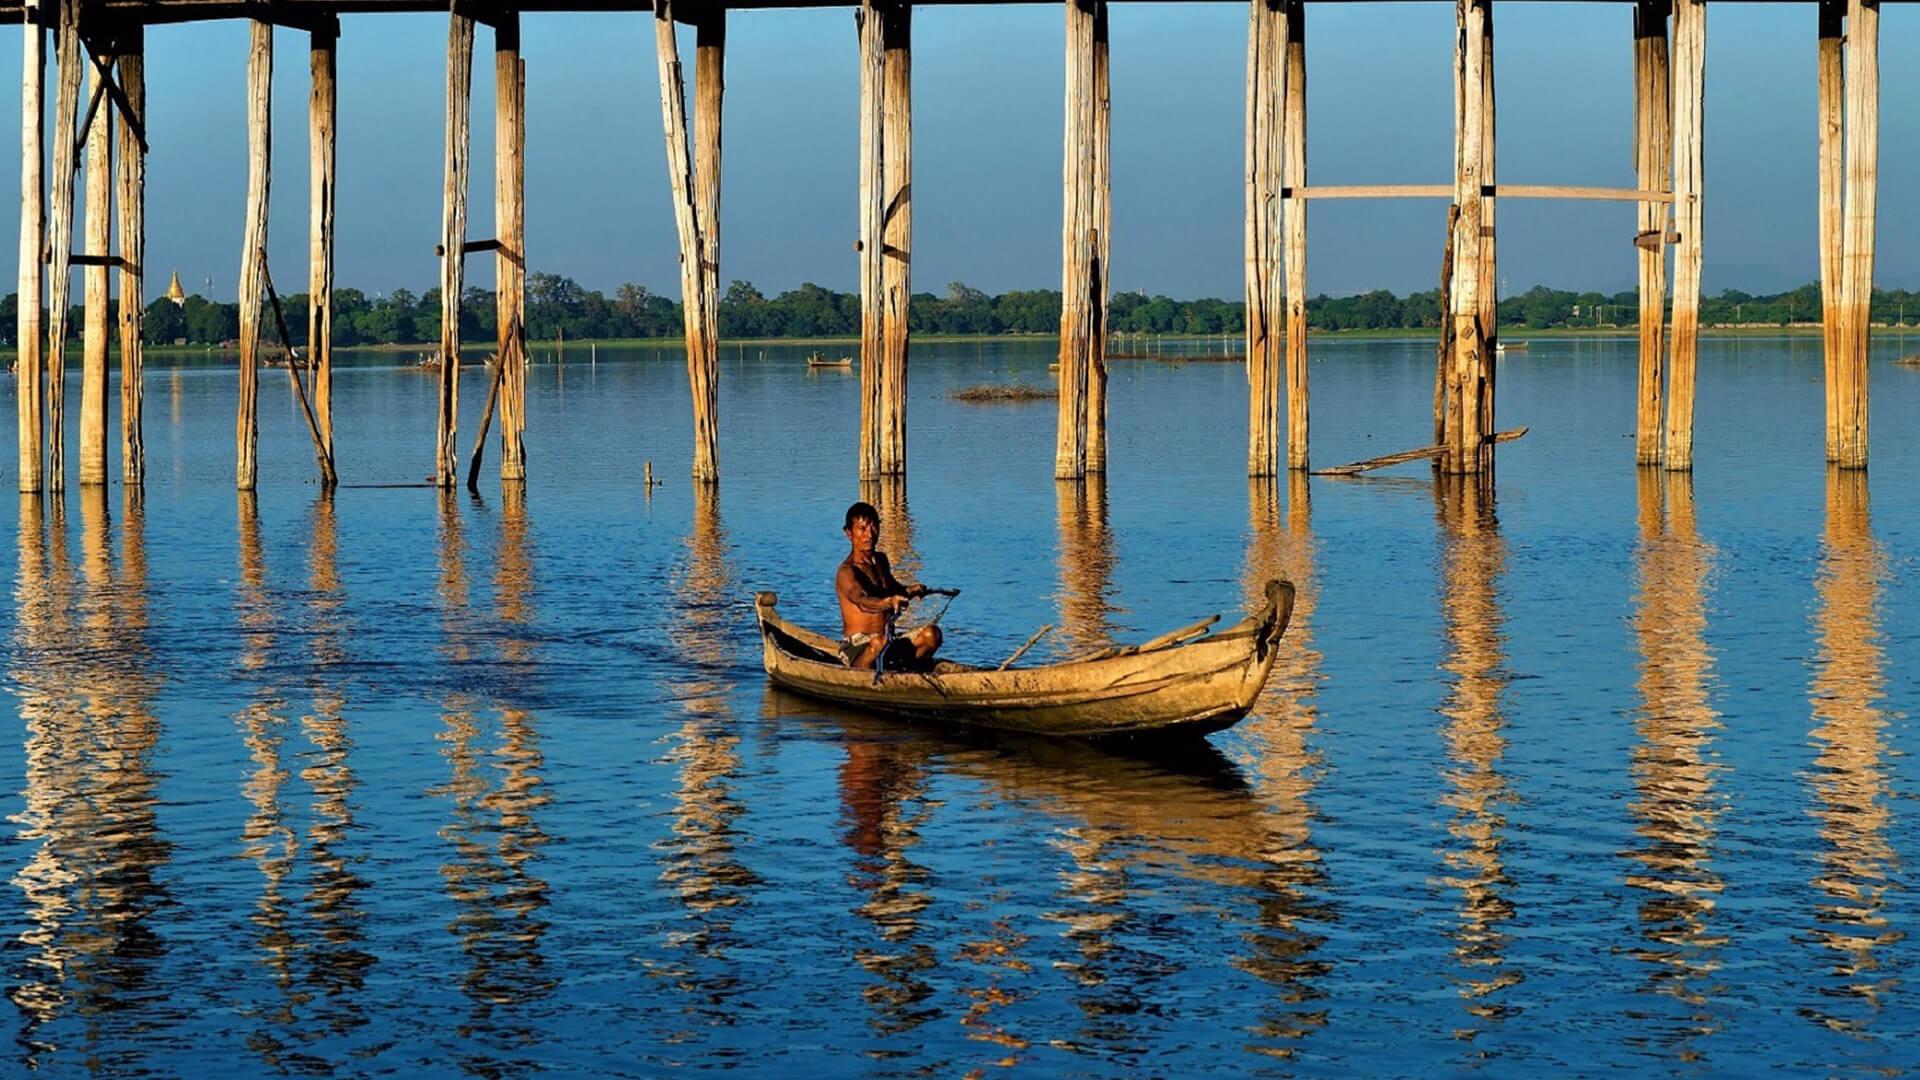 Authentic_Myanmar_Adventure-thumbV2-resize.jpg